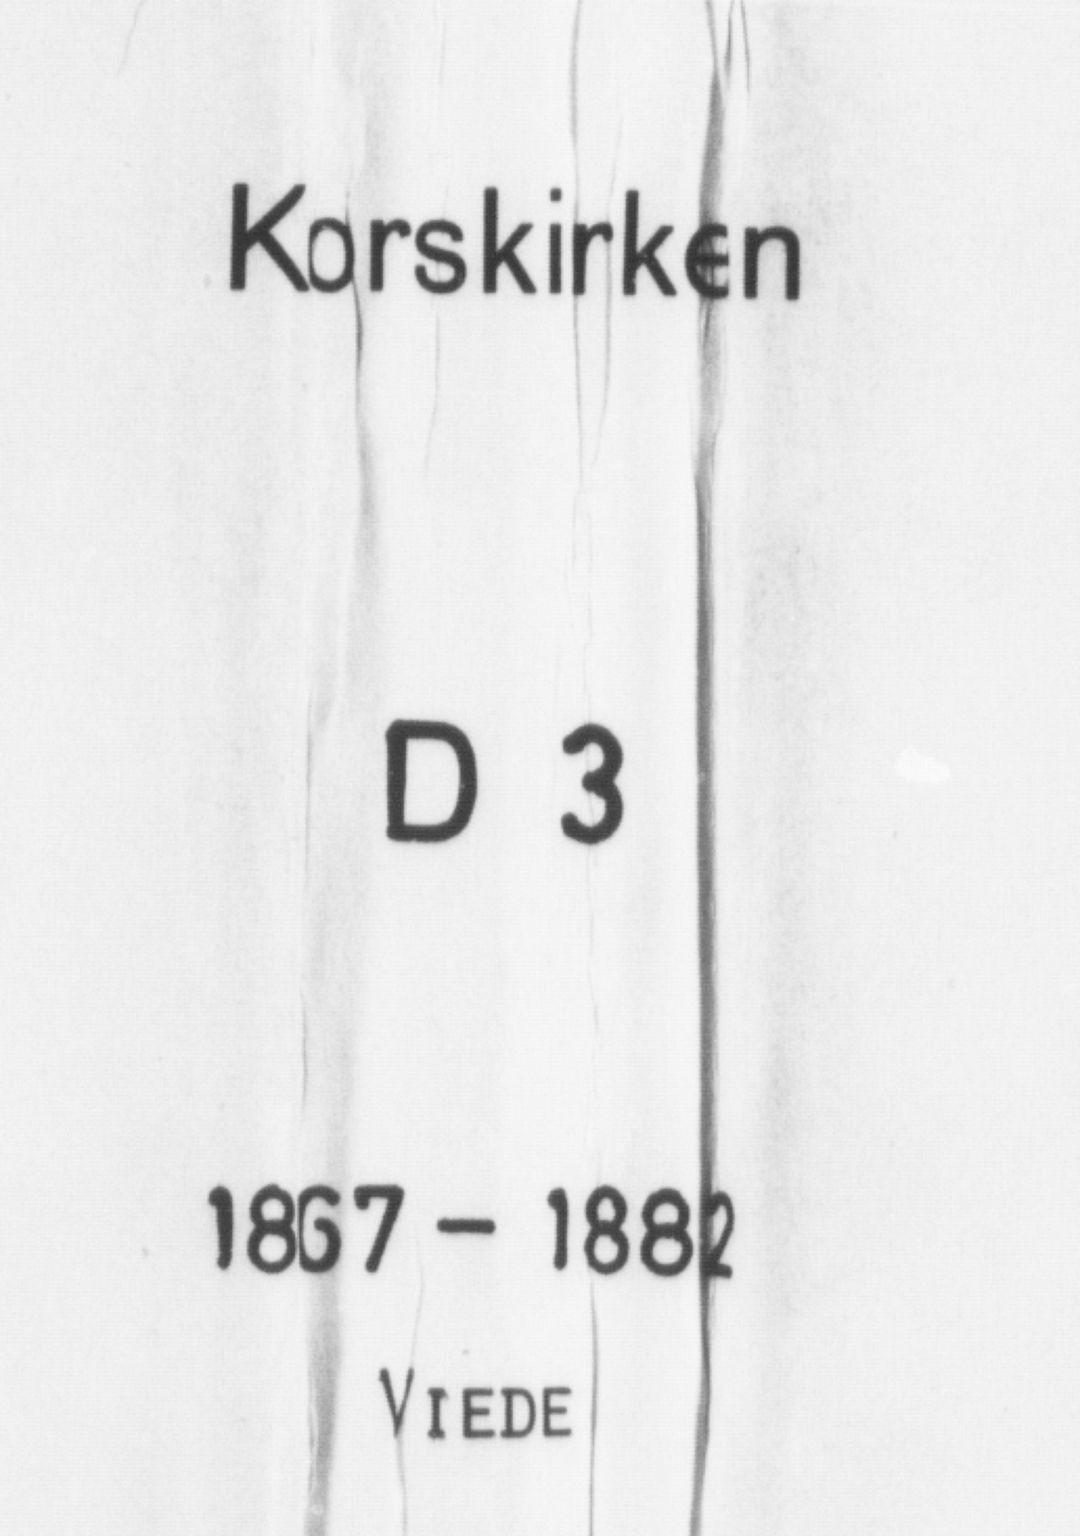 SAB, Korskirken Sokneprestembete, H/Haa/L0036: Ministerialbok nr. D 3, 1867-1882